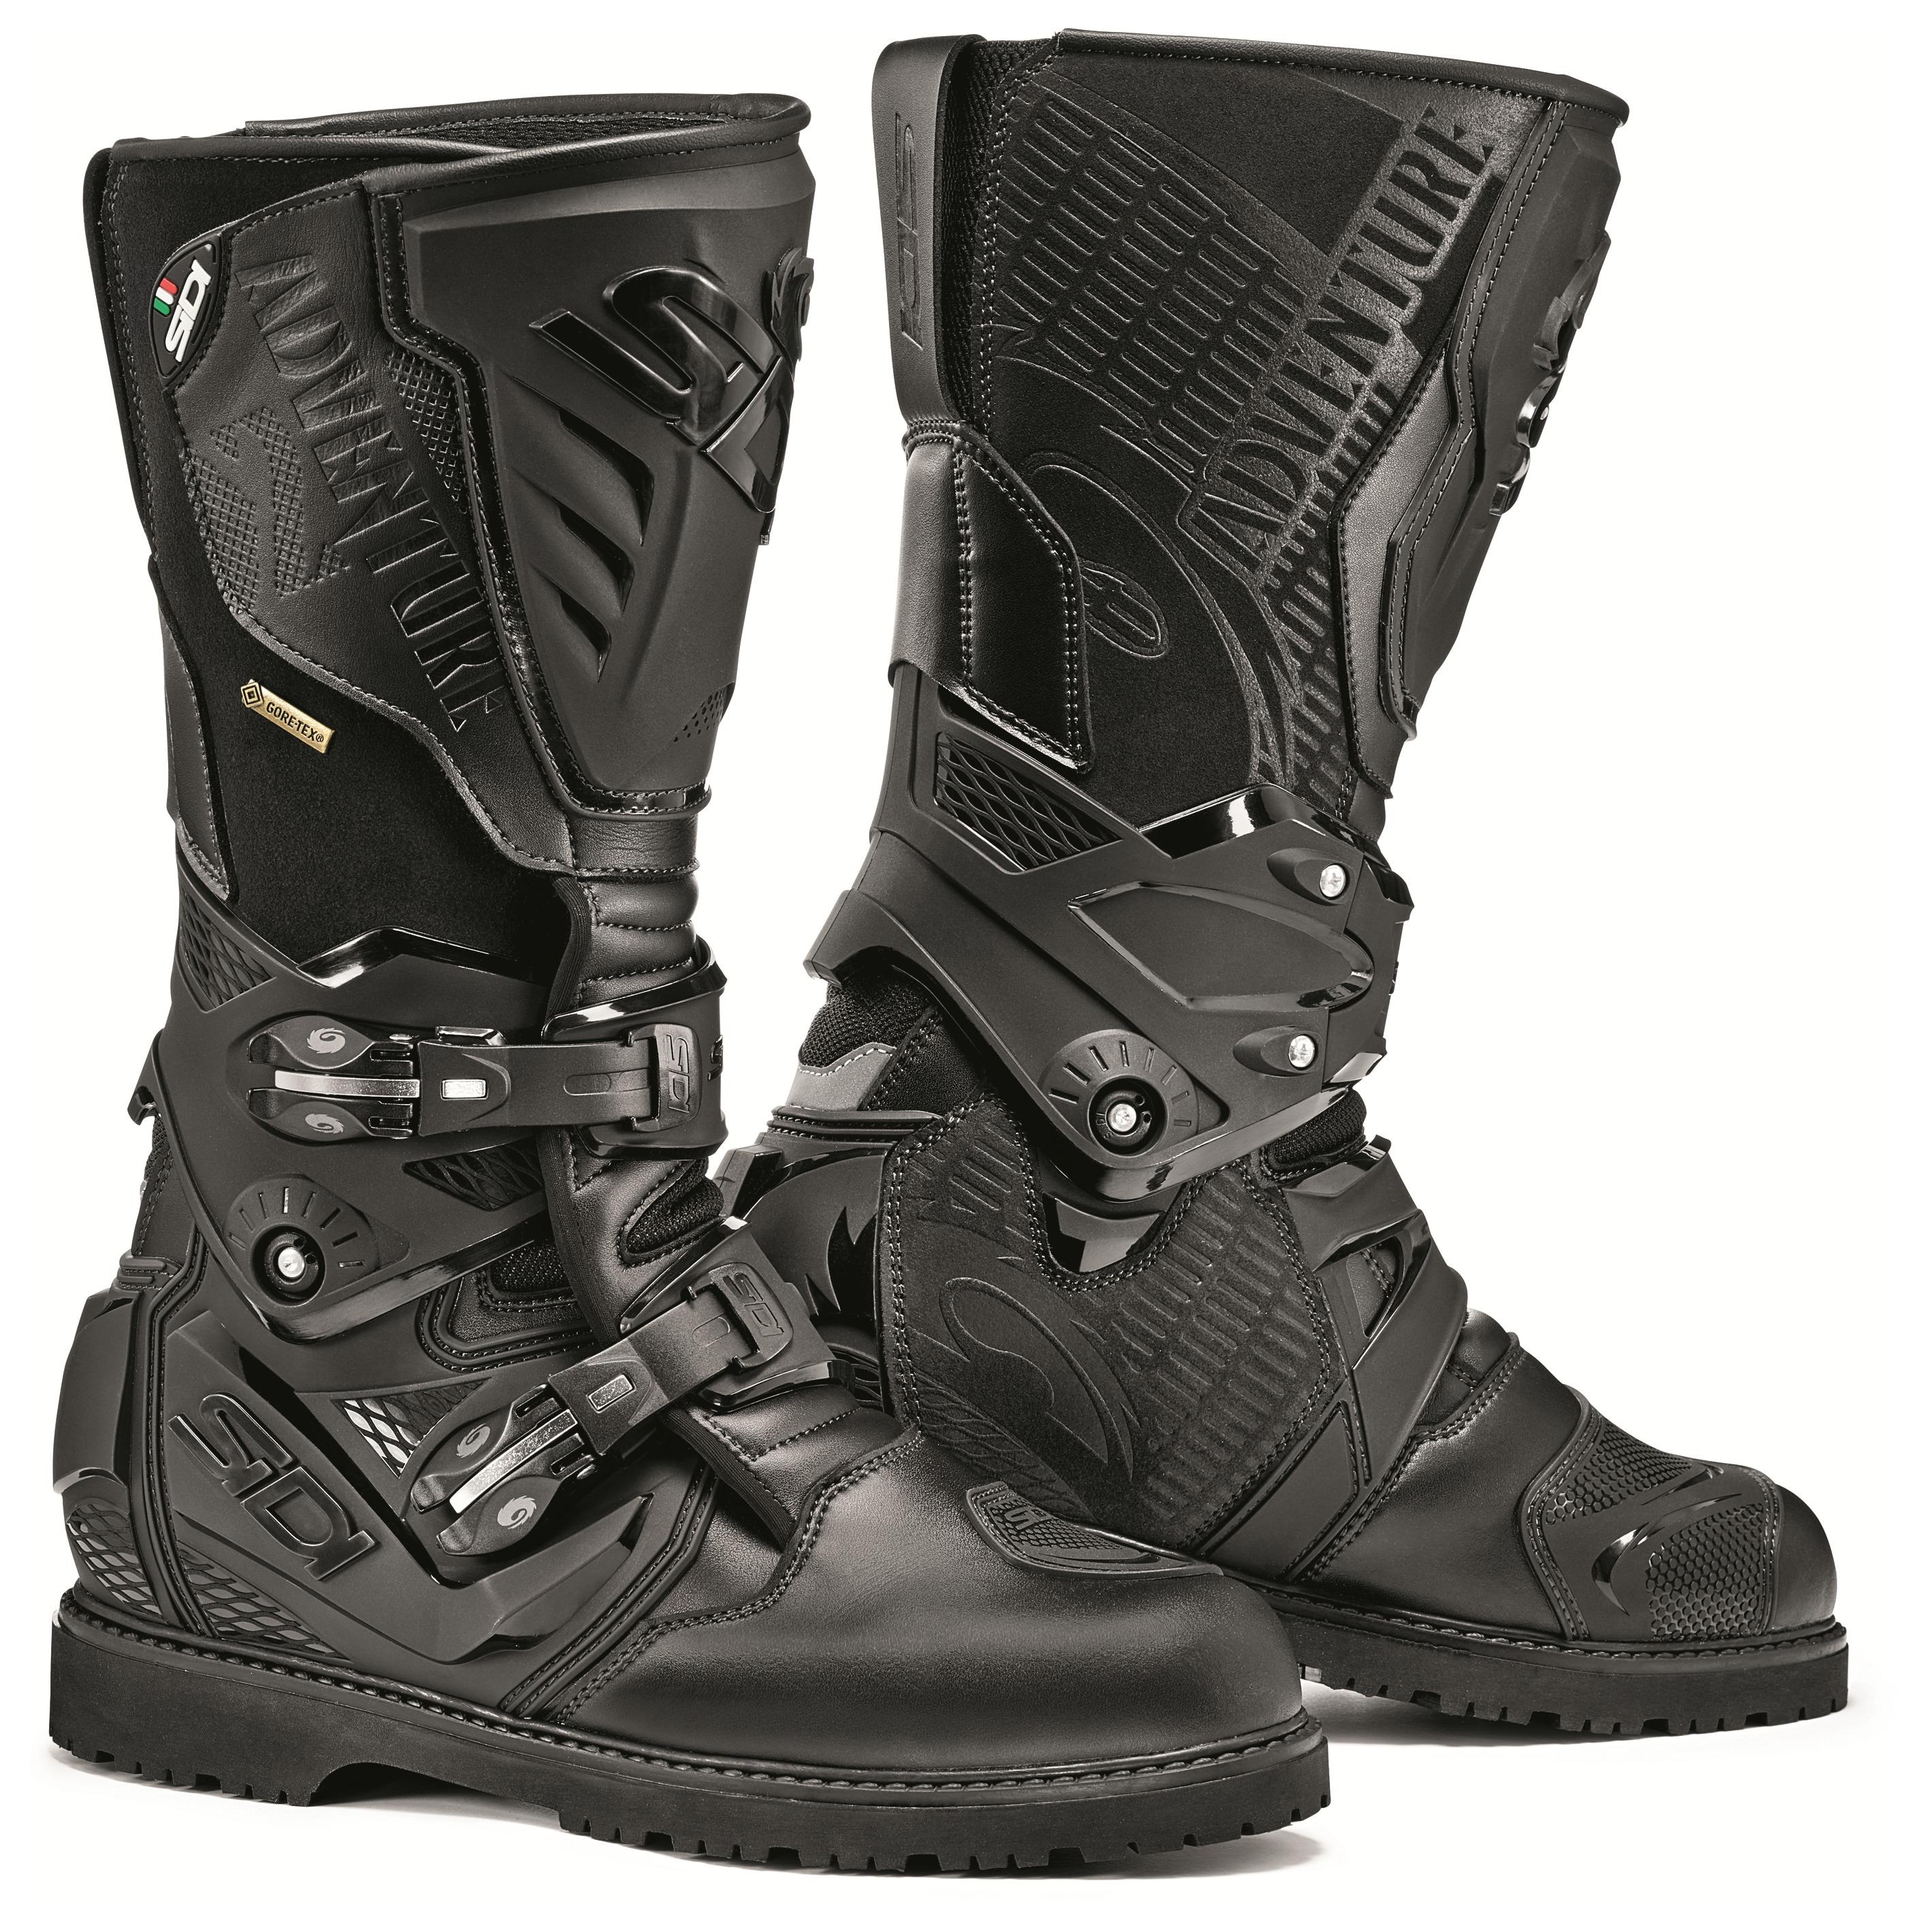 SIDI Adventure 2 GTX Boots